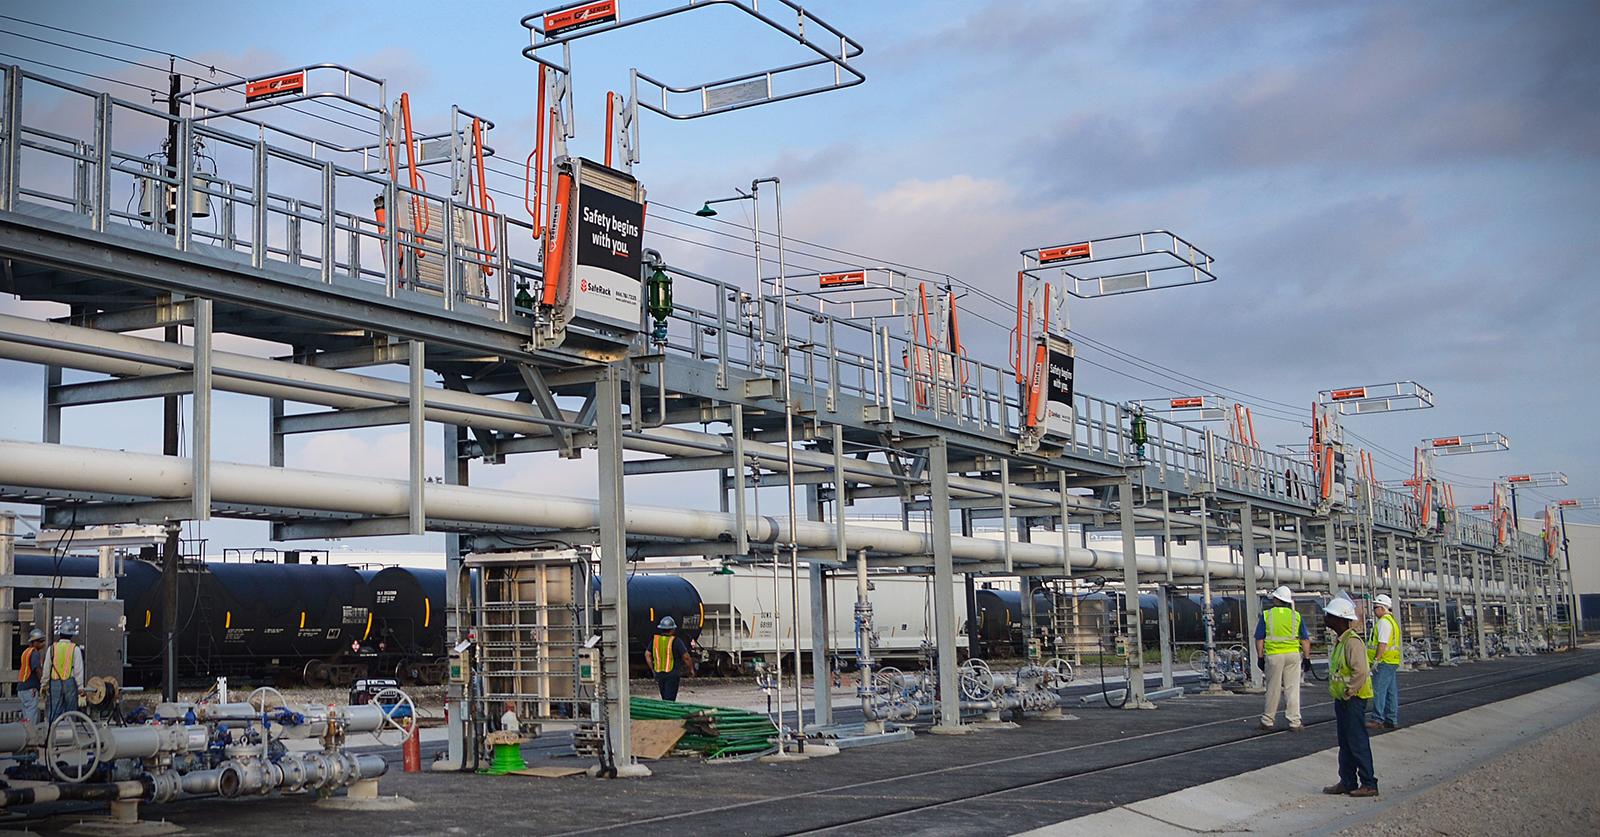 Long Metal Work Platform for Railcar Loading